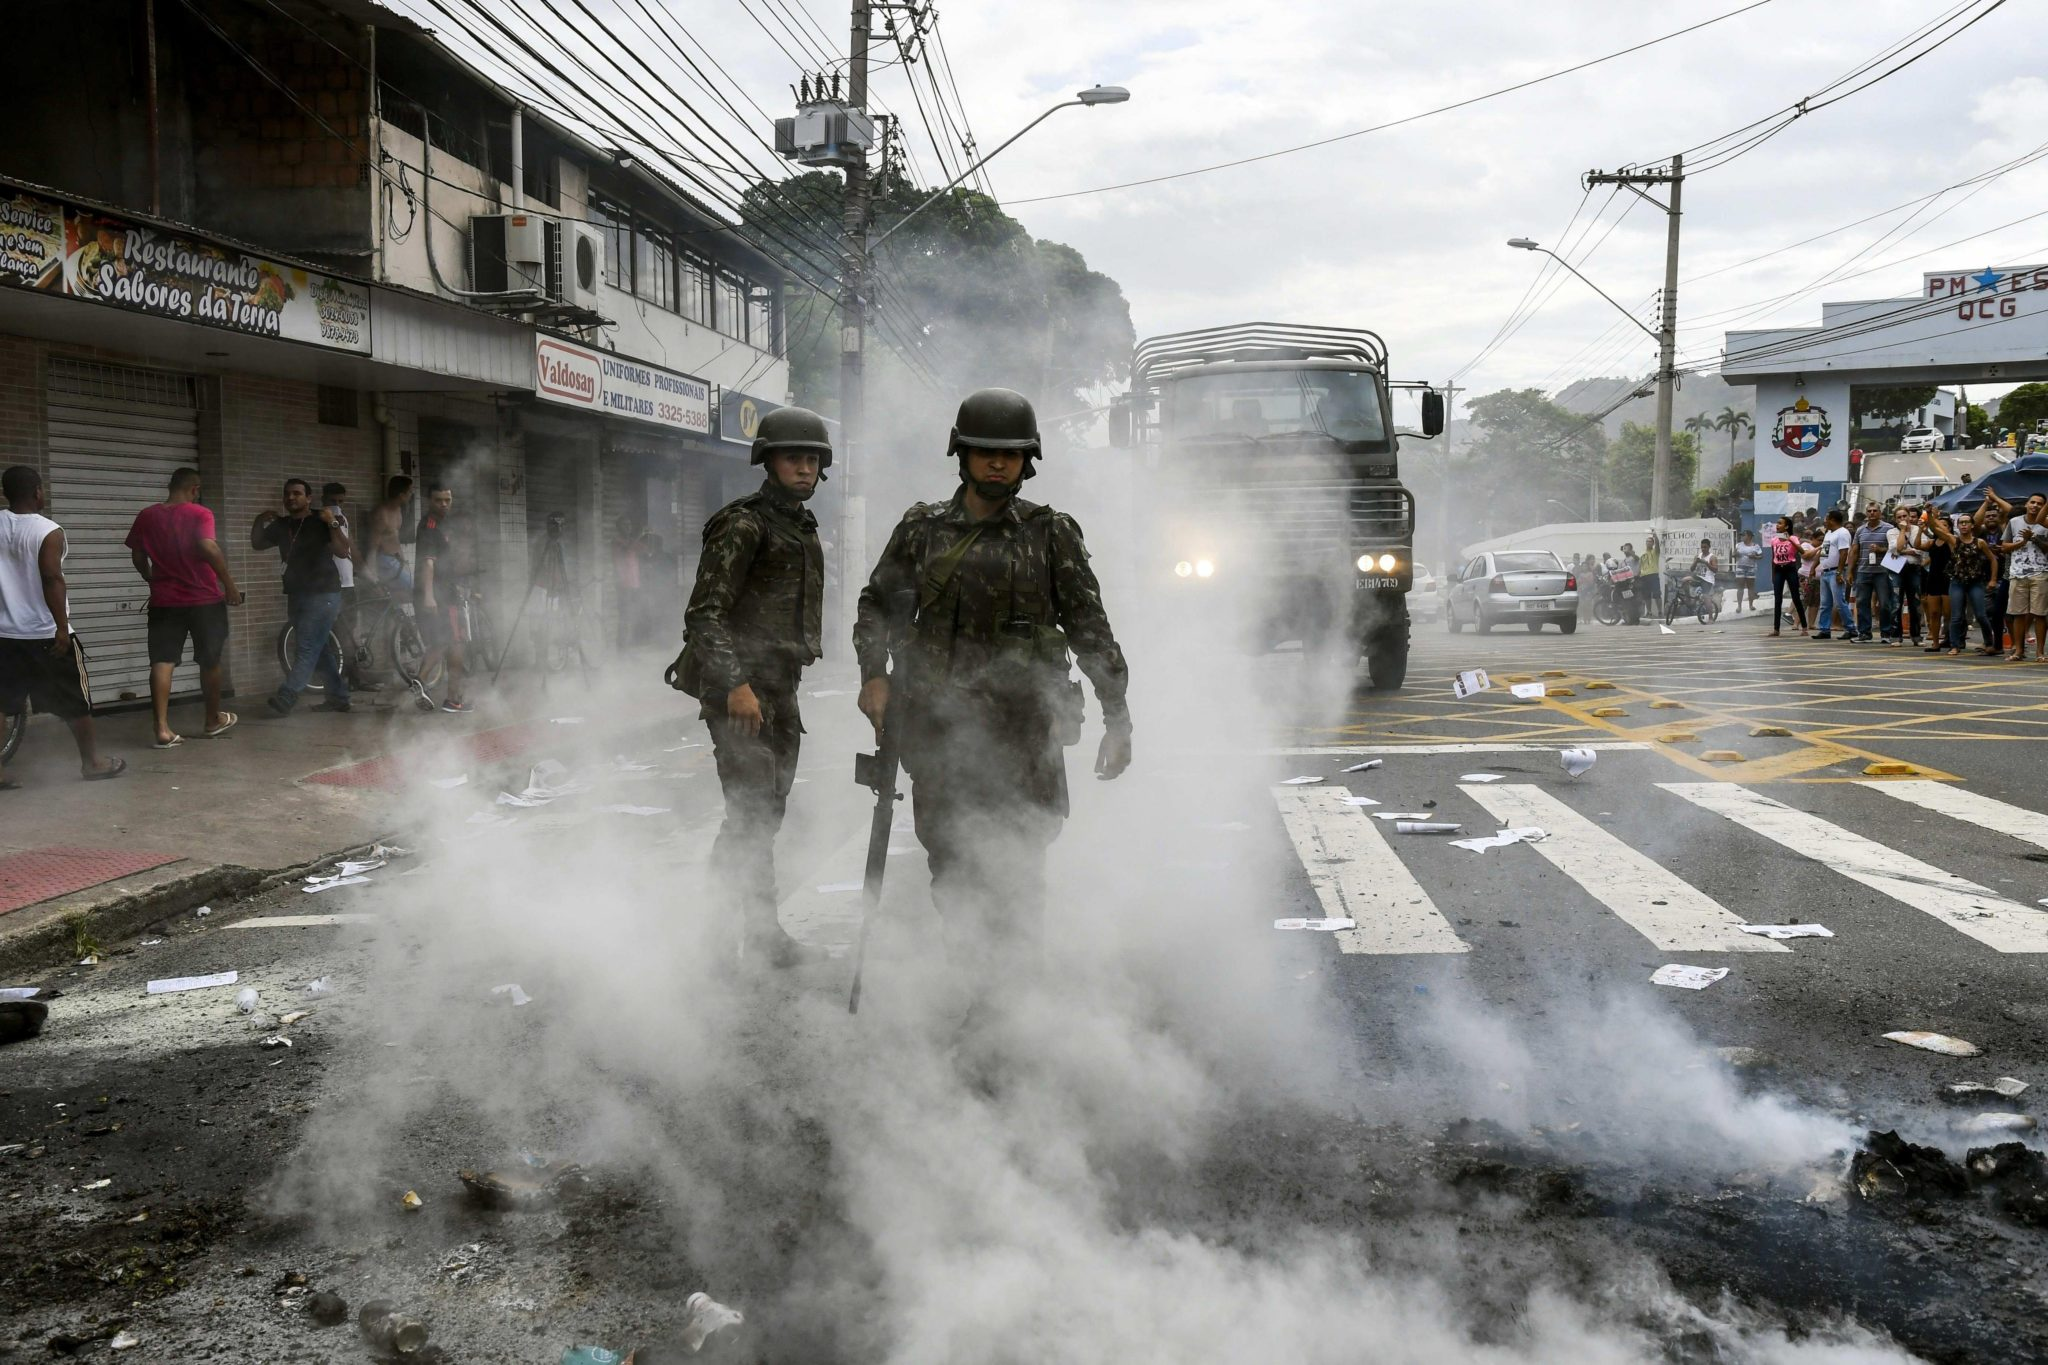 Brazylia: zamieszki podczas antypolicyjnego protestu w Espirito Santo (foto. PAP/EPA/Gabriel Lordello)